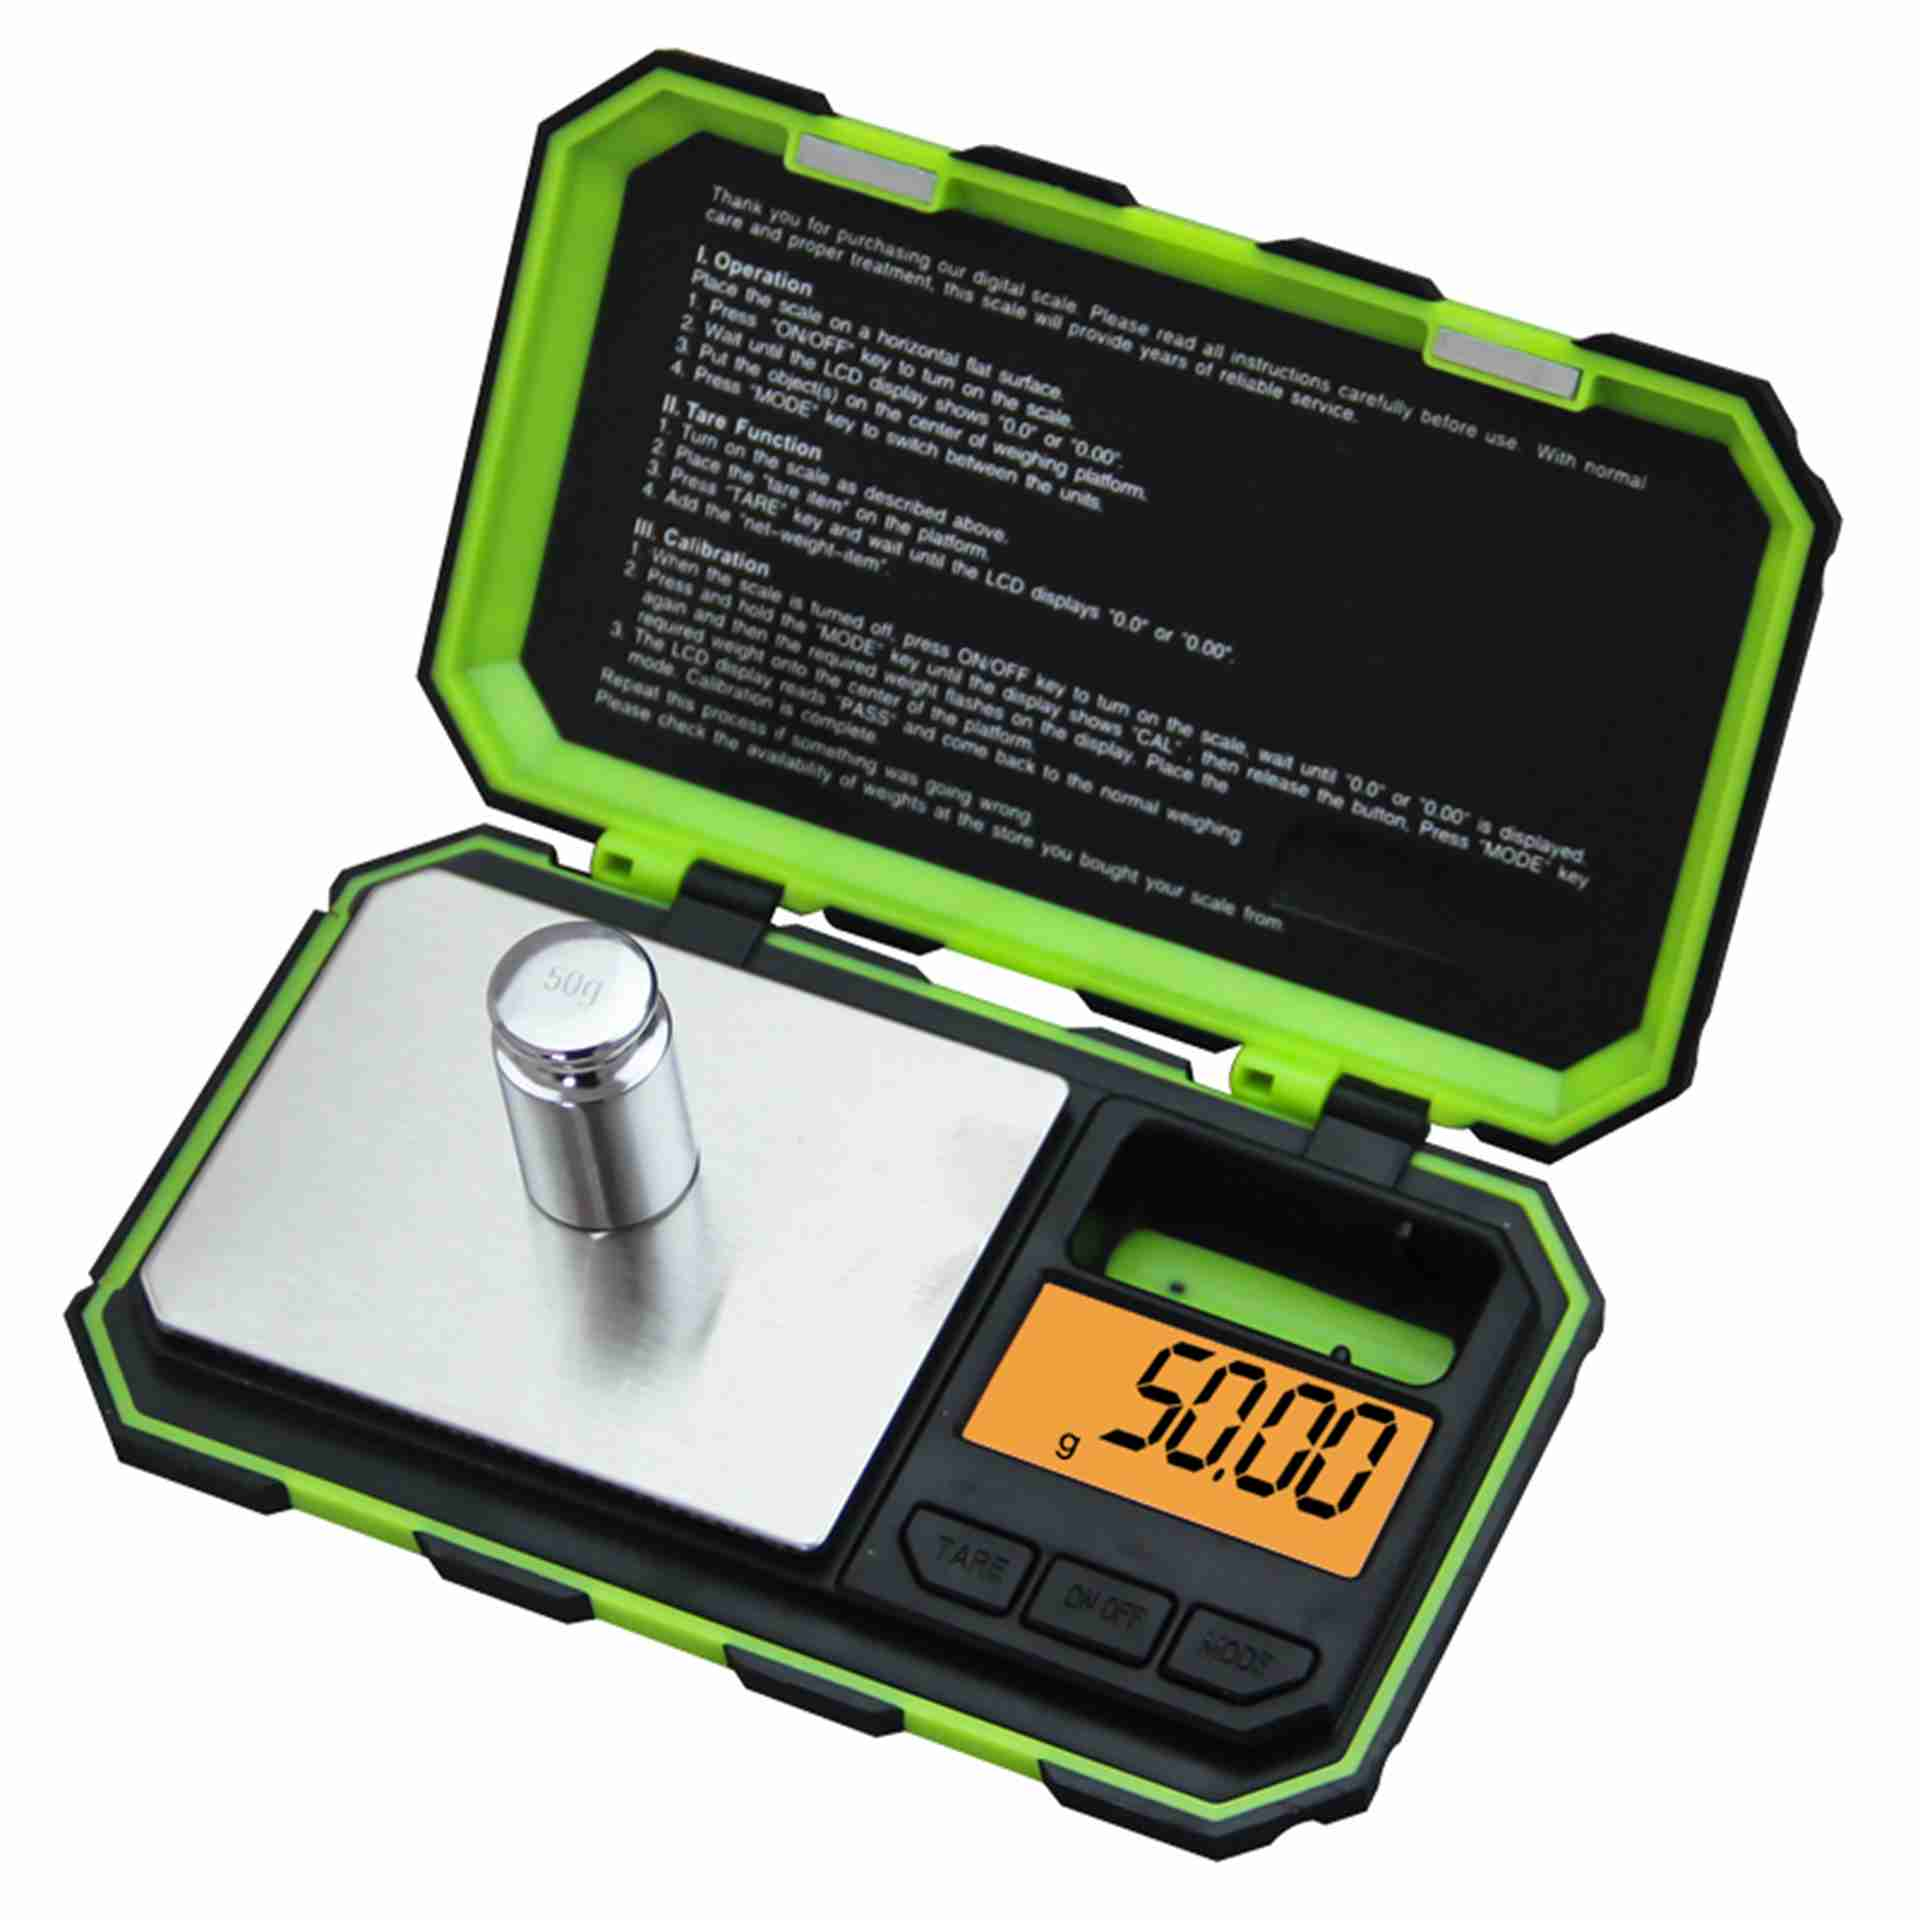 200*0.01g מיני גבוהה דיוק דיגיטלי נייד תכשיטי זהב בקנה מידה מקצועי Banlance משקל כלים אלקטרוני מטבח מכונהמאזניים לשקילה   -